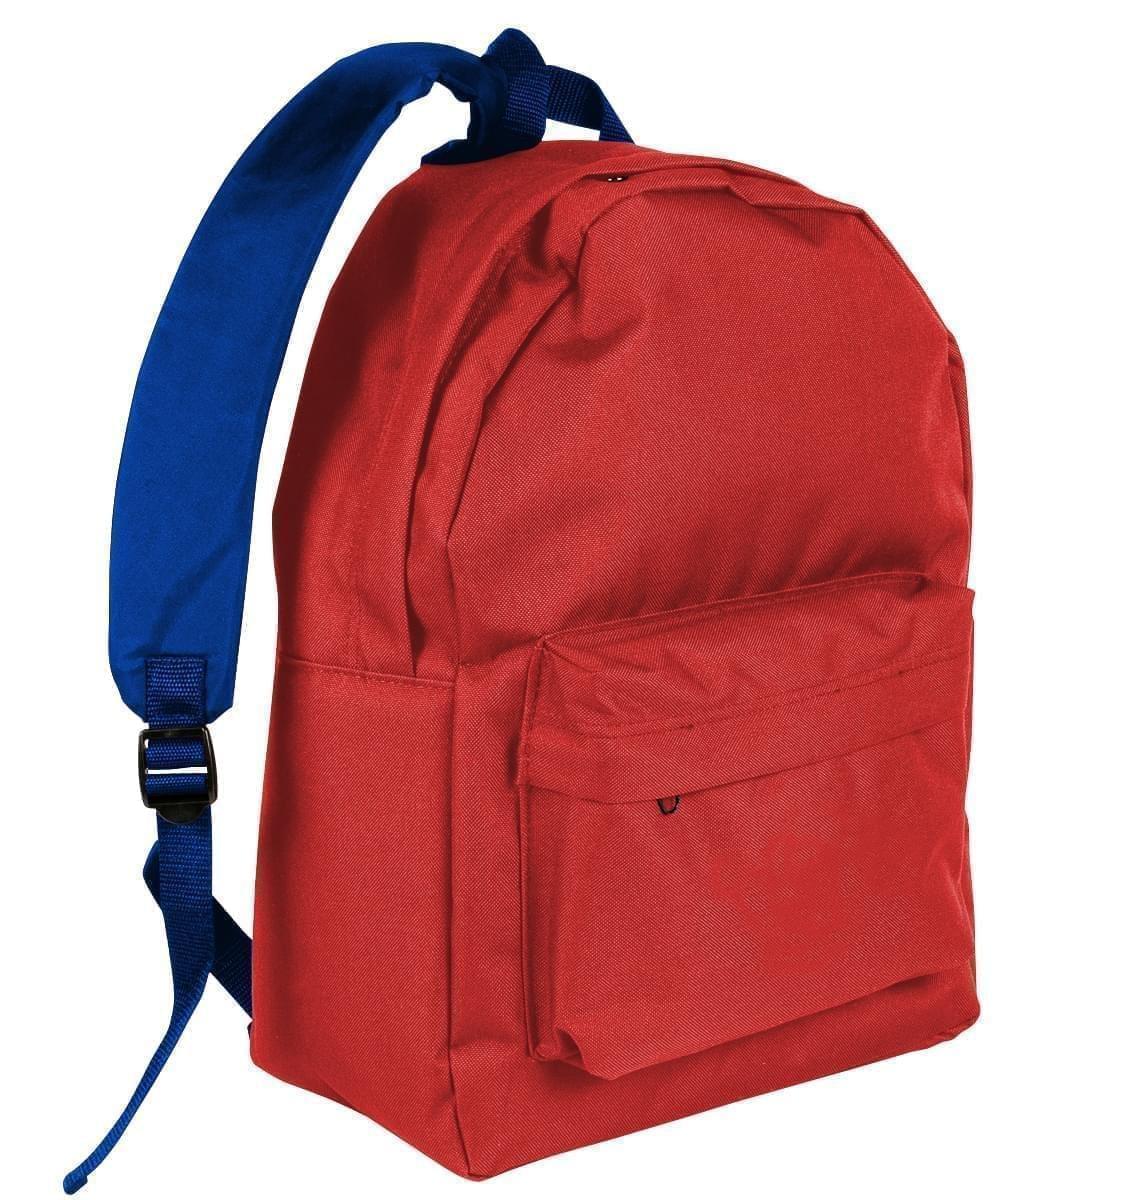 USA Made Nylon Poly Backpack Knapsacks, Red-Royal Blue, 8960-AZ3